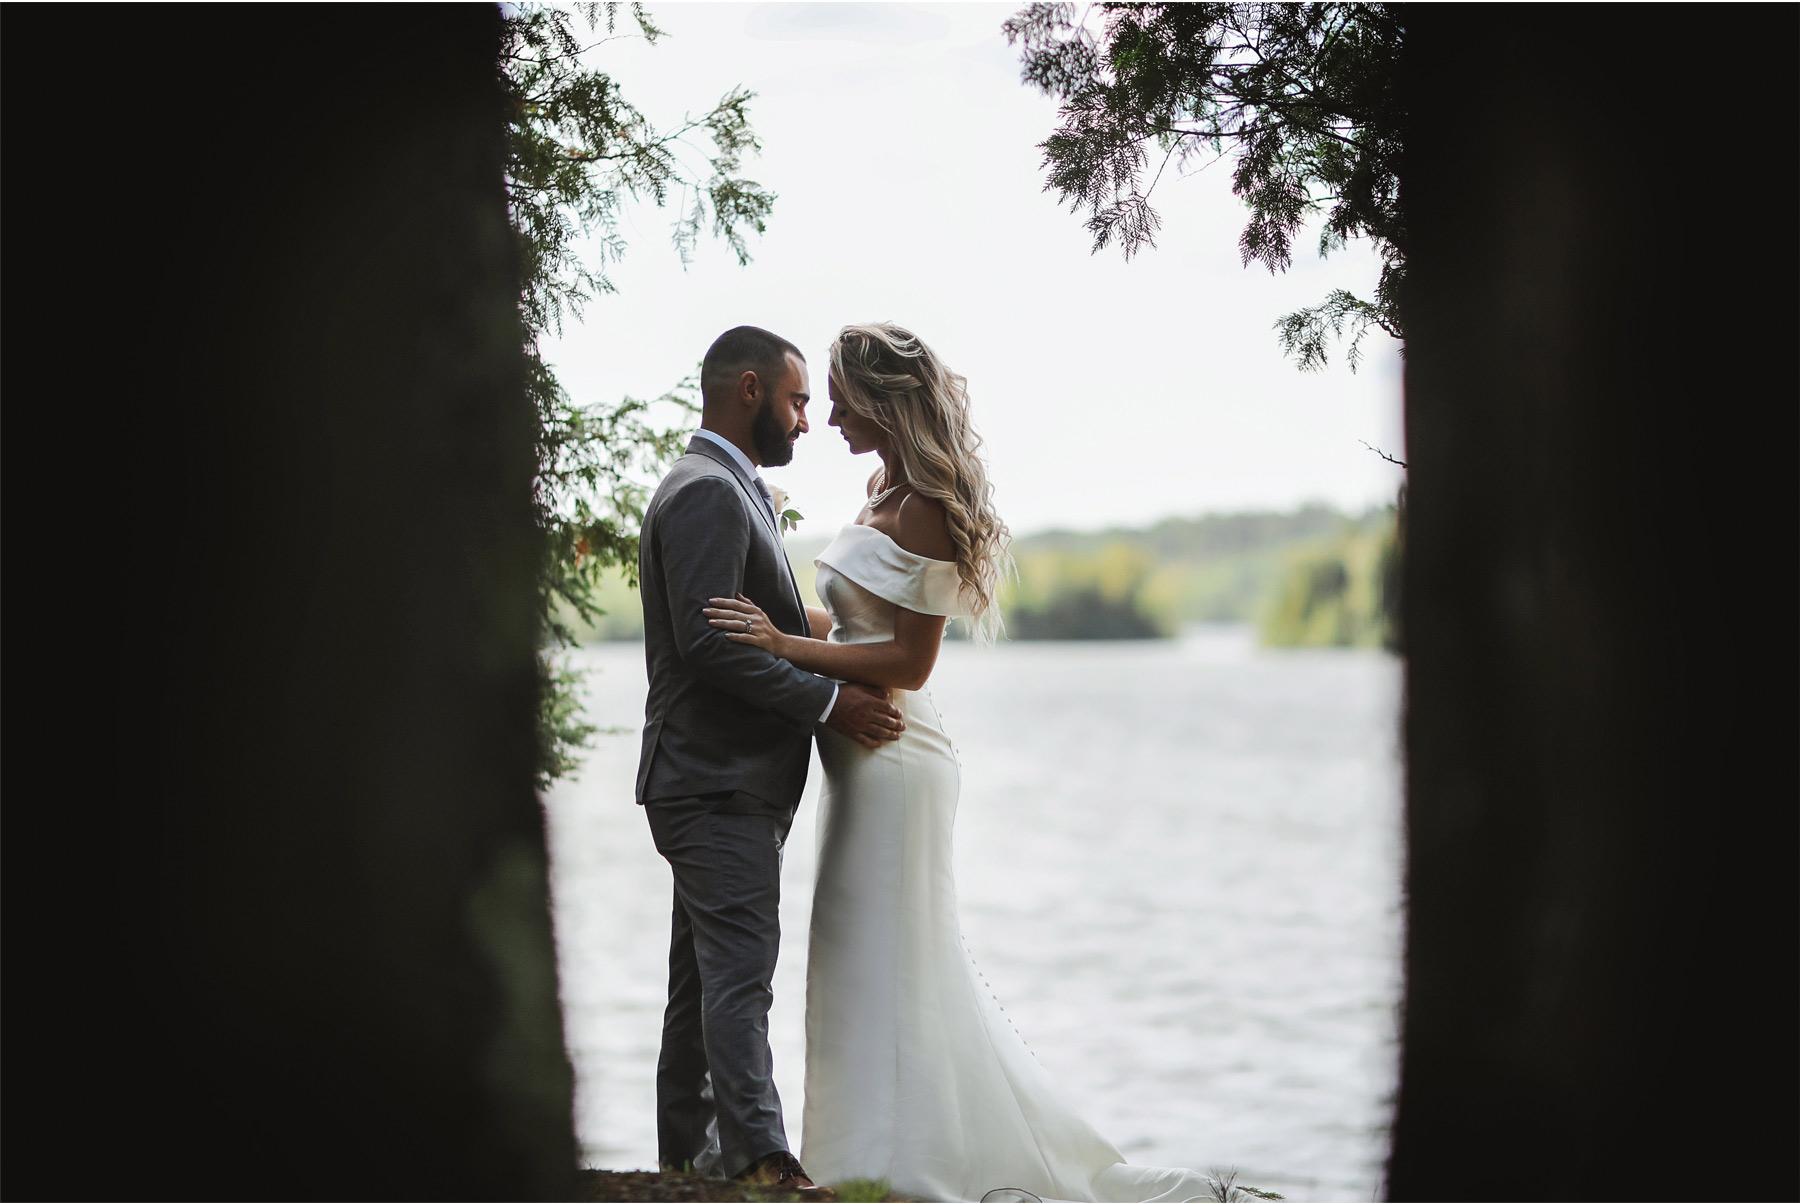 17-Ely-Minnesota-North-Wedding-by-Andrew-Vick-Photography-Lake-Beach-Bride-Groom-Katie-and-Joe.jpg